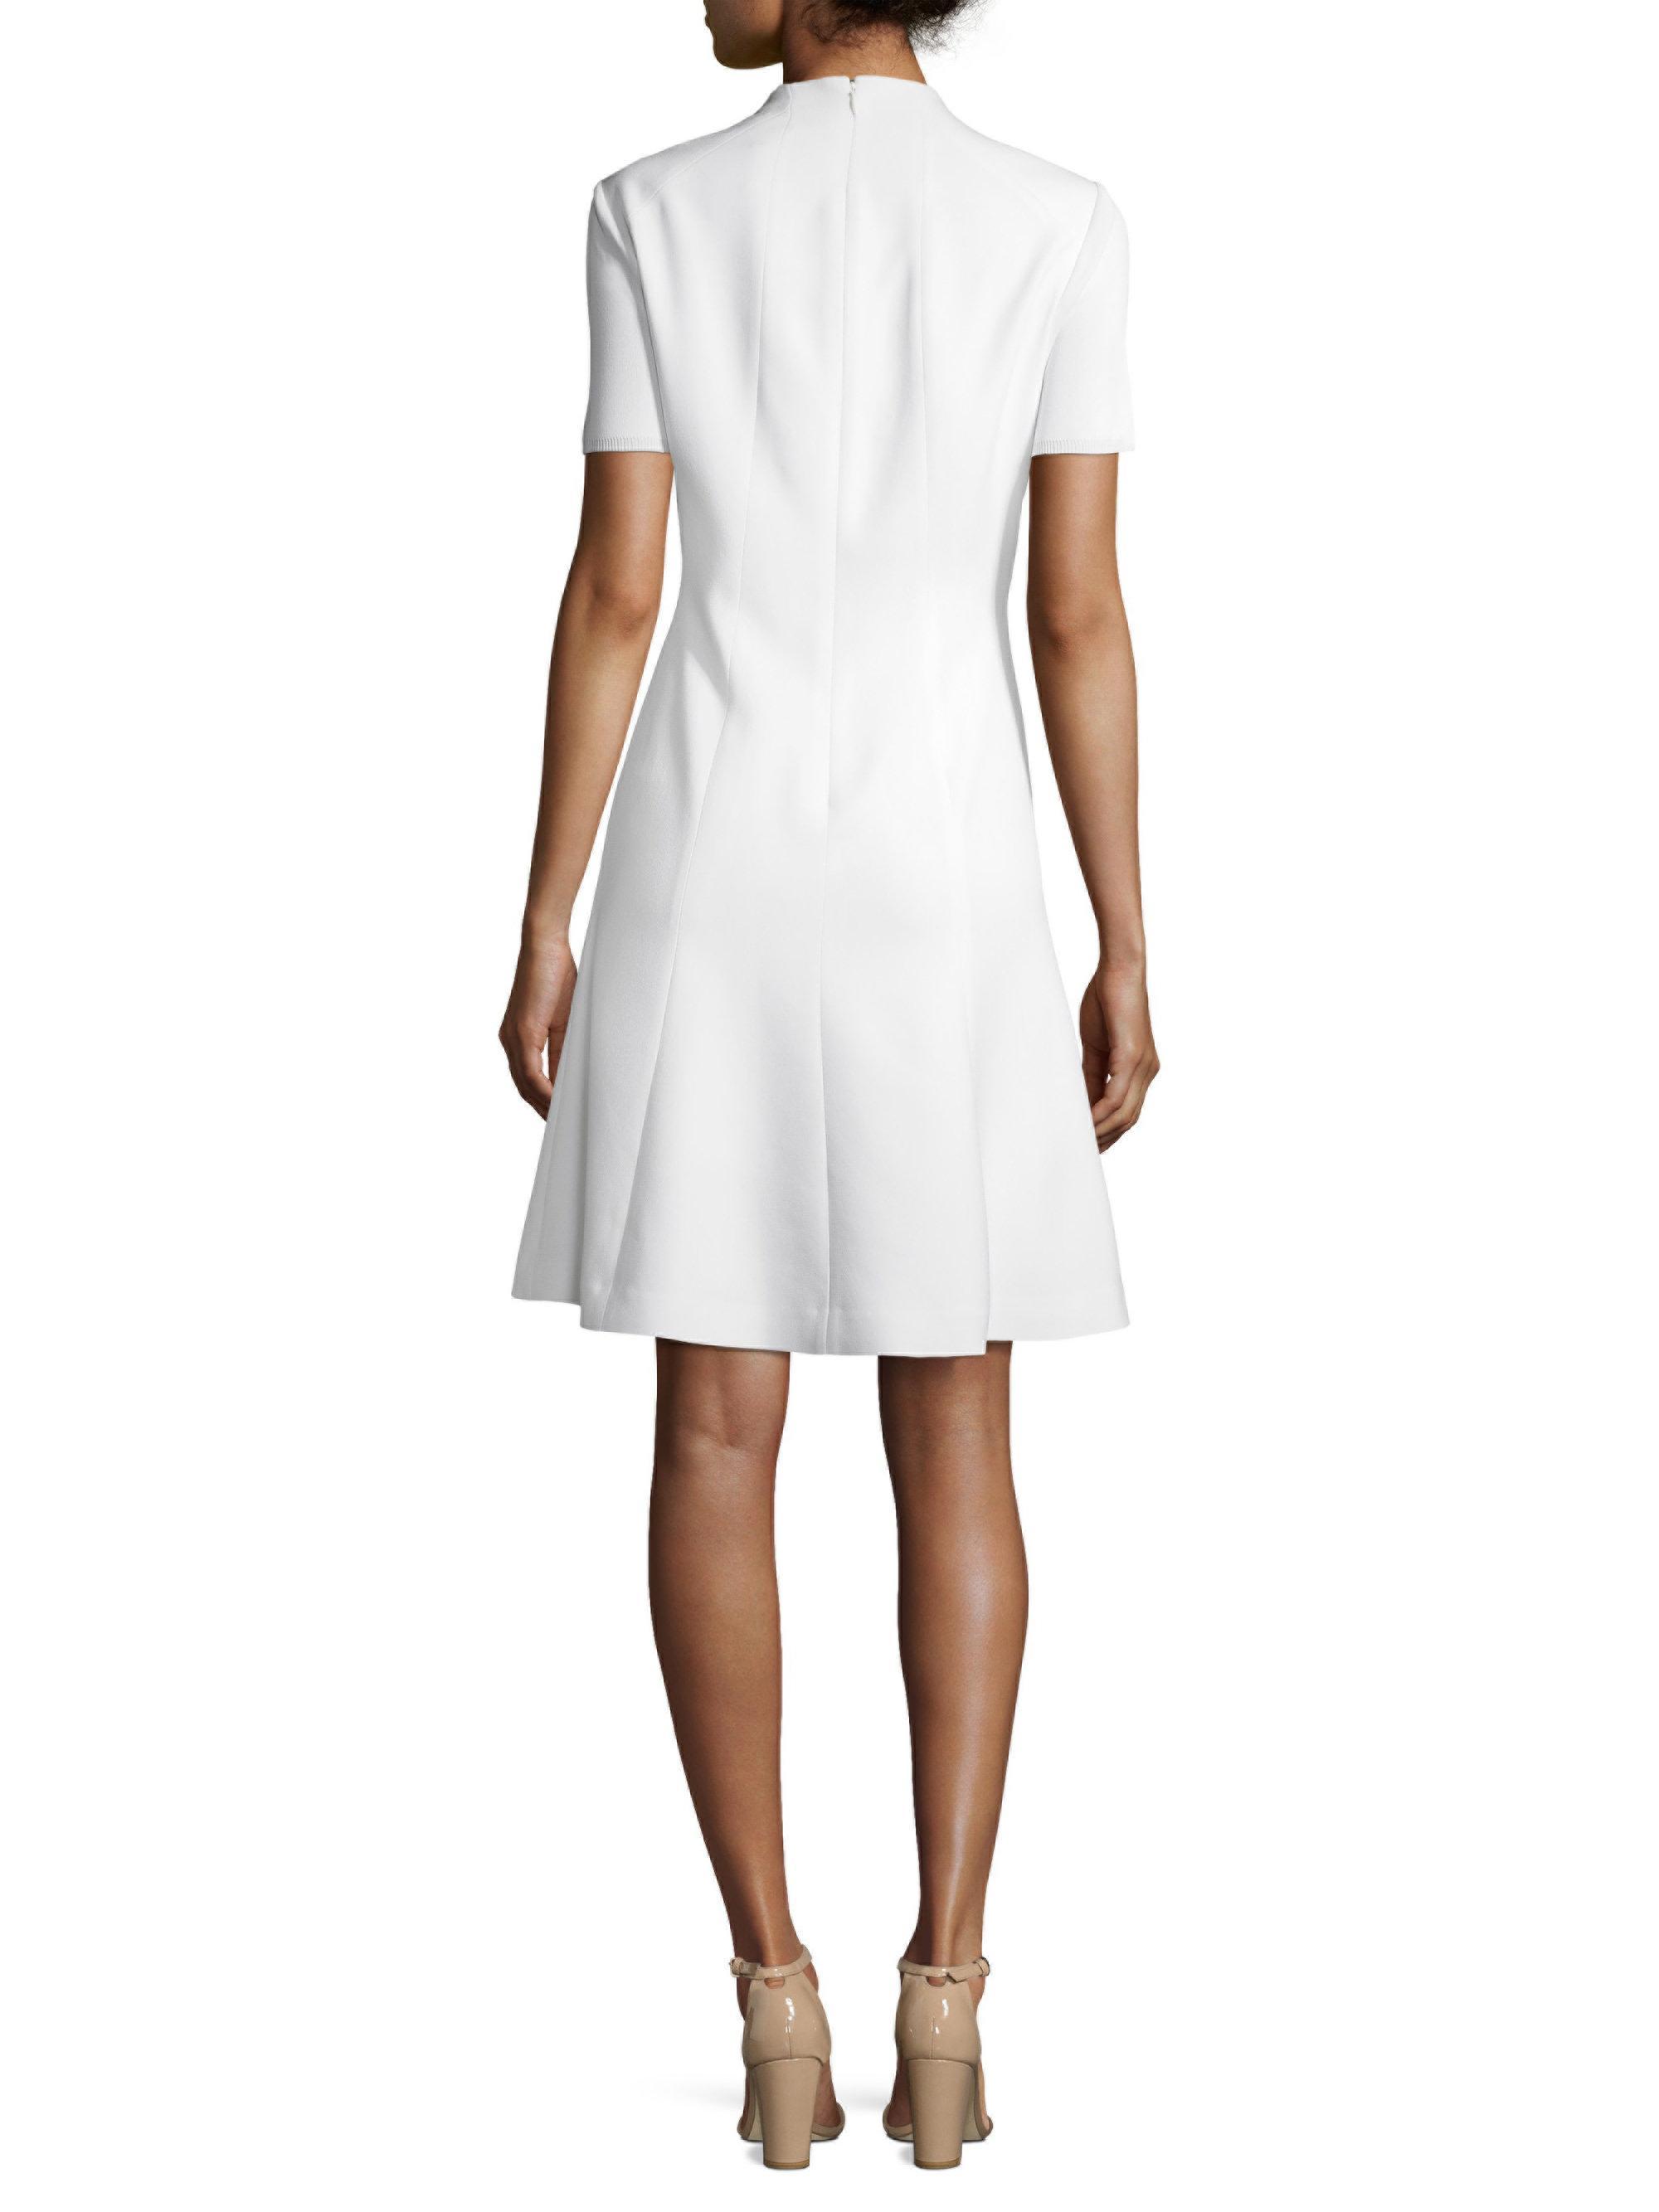 cca474feb403 Elie Tahari Yuki Hardware Splitneck Flare Dress in White - Lyst